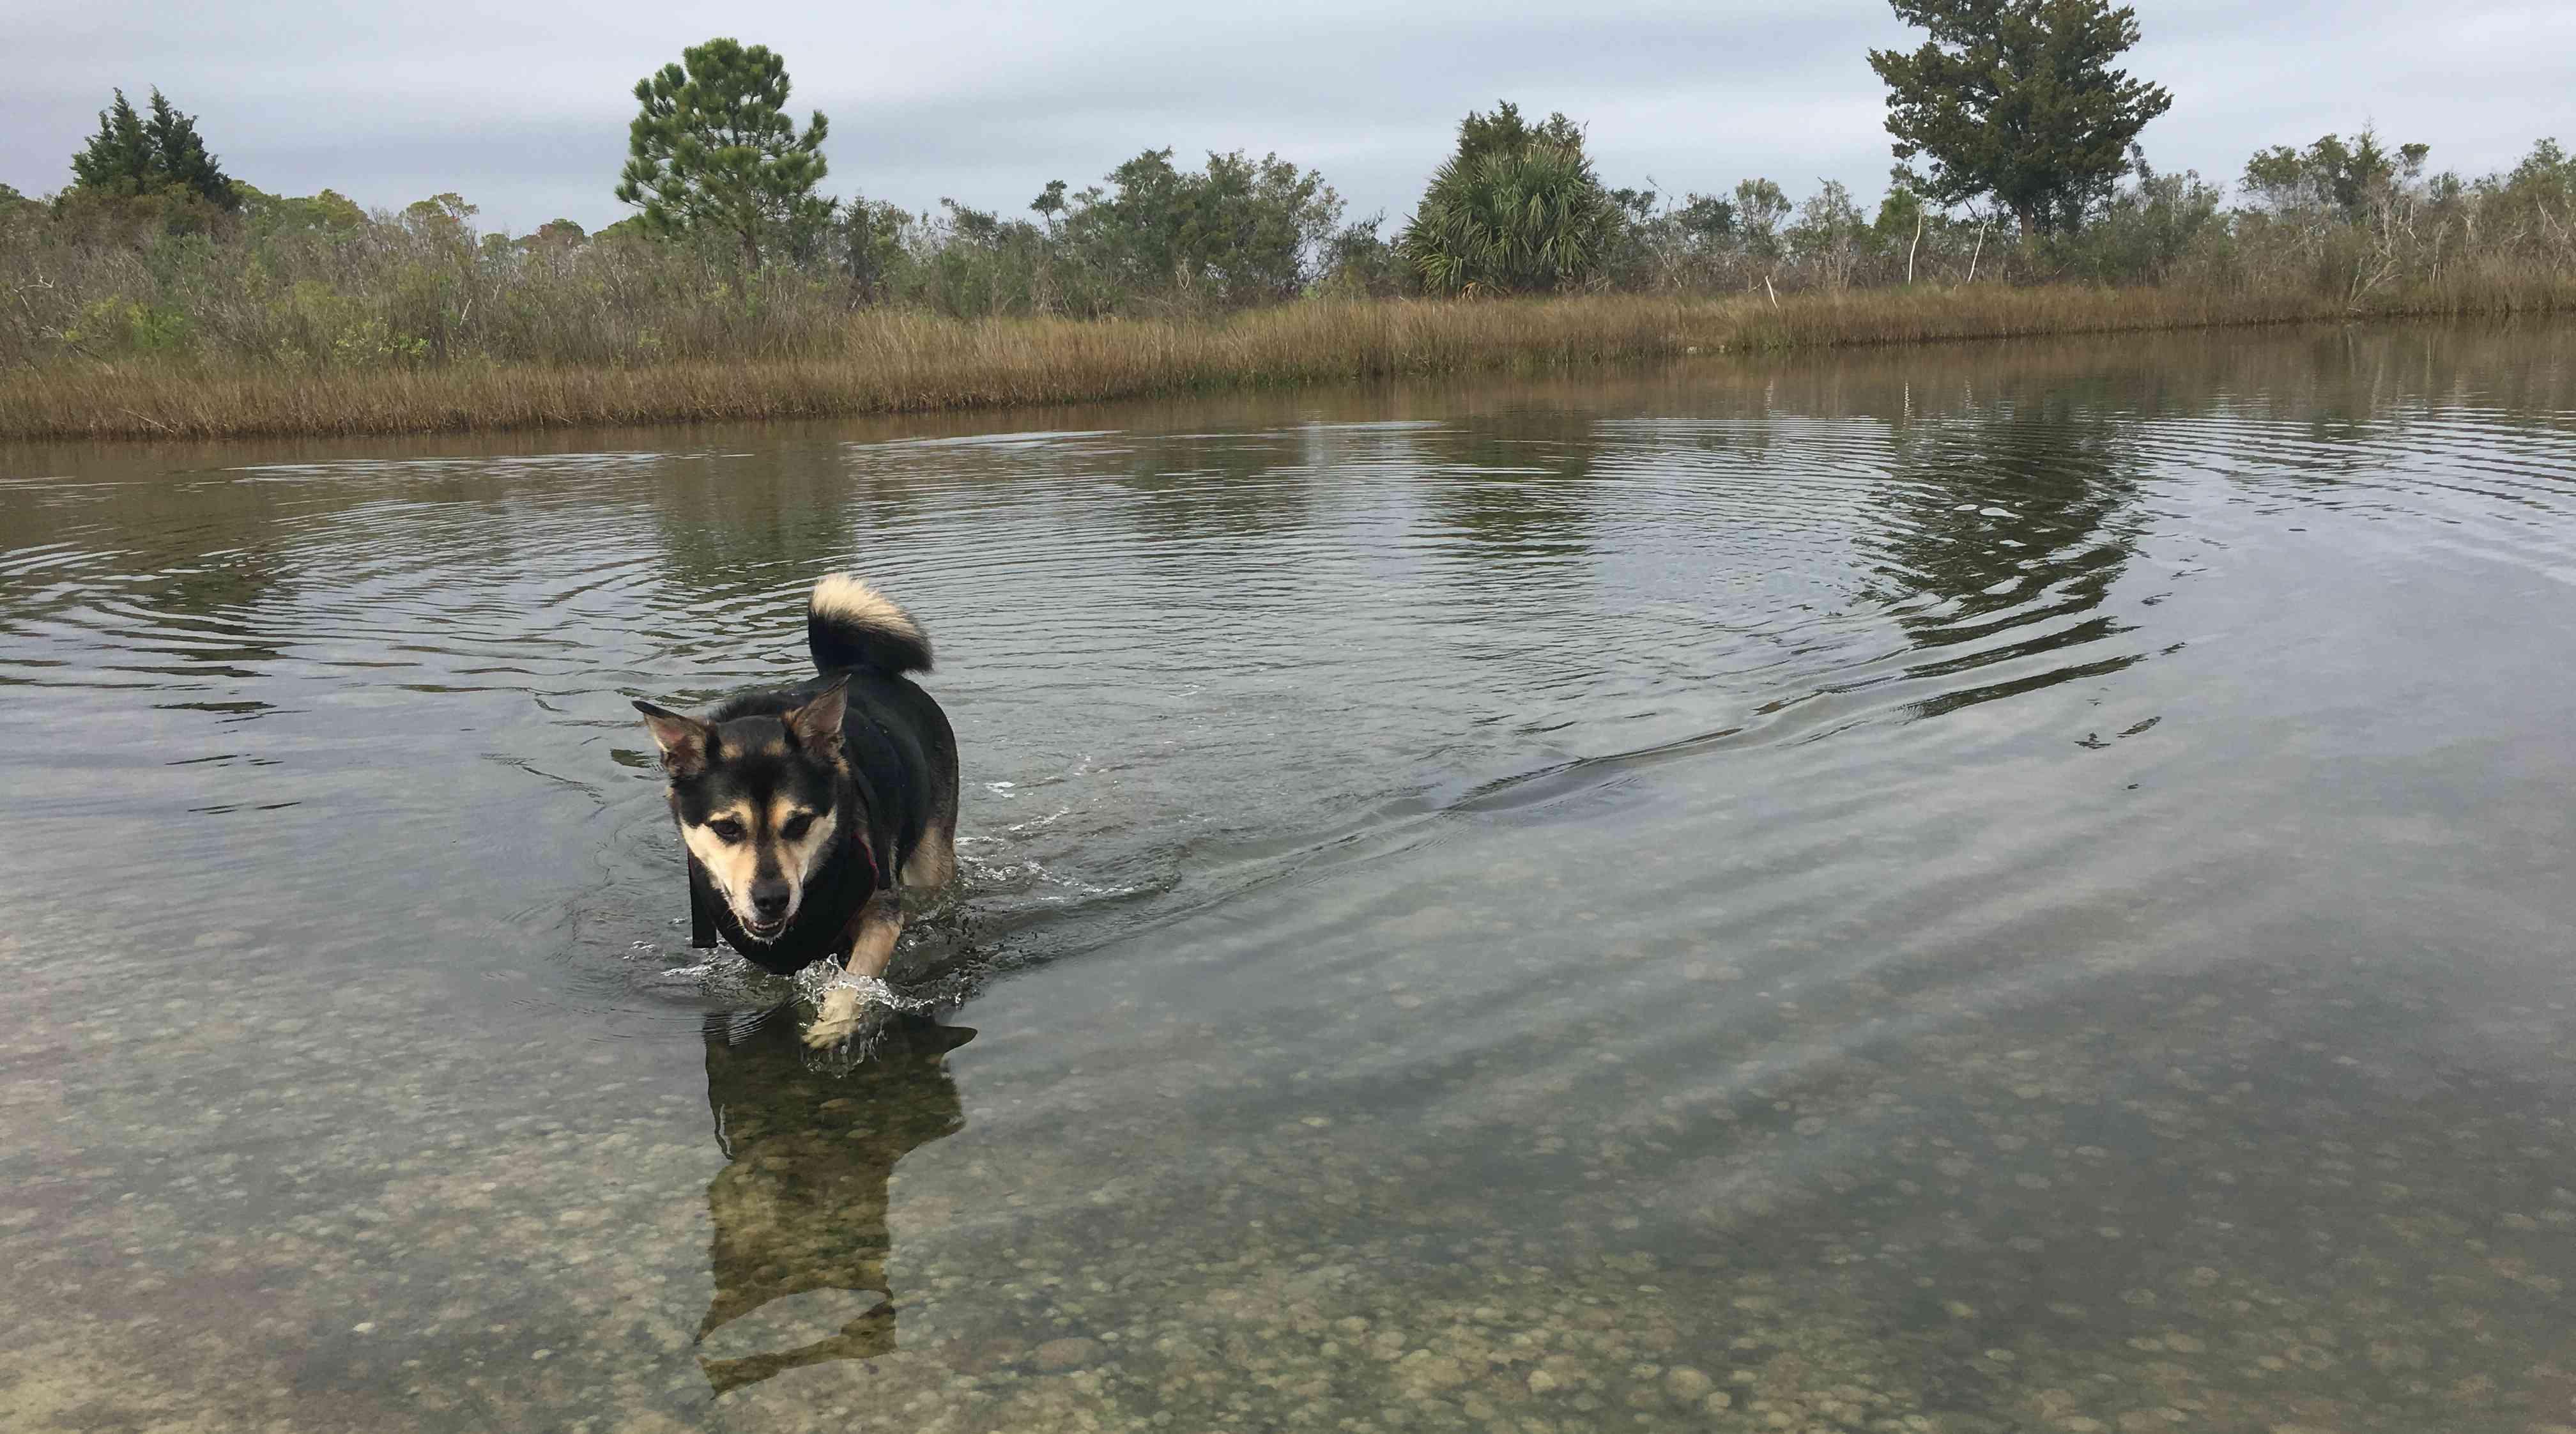 Otis, a mixed-breed rescue dog, fishing